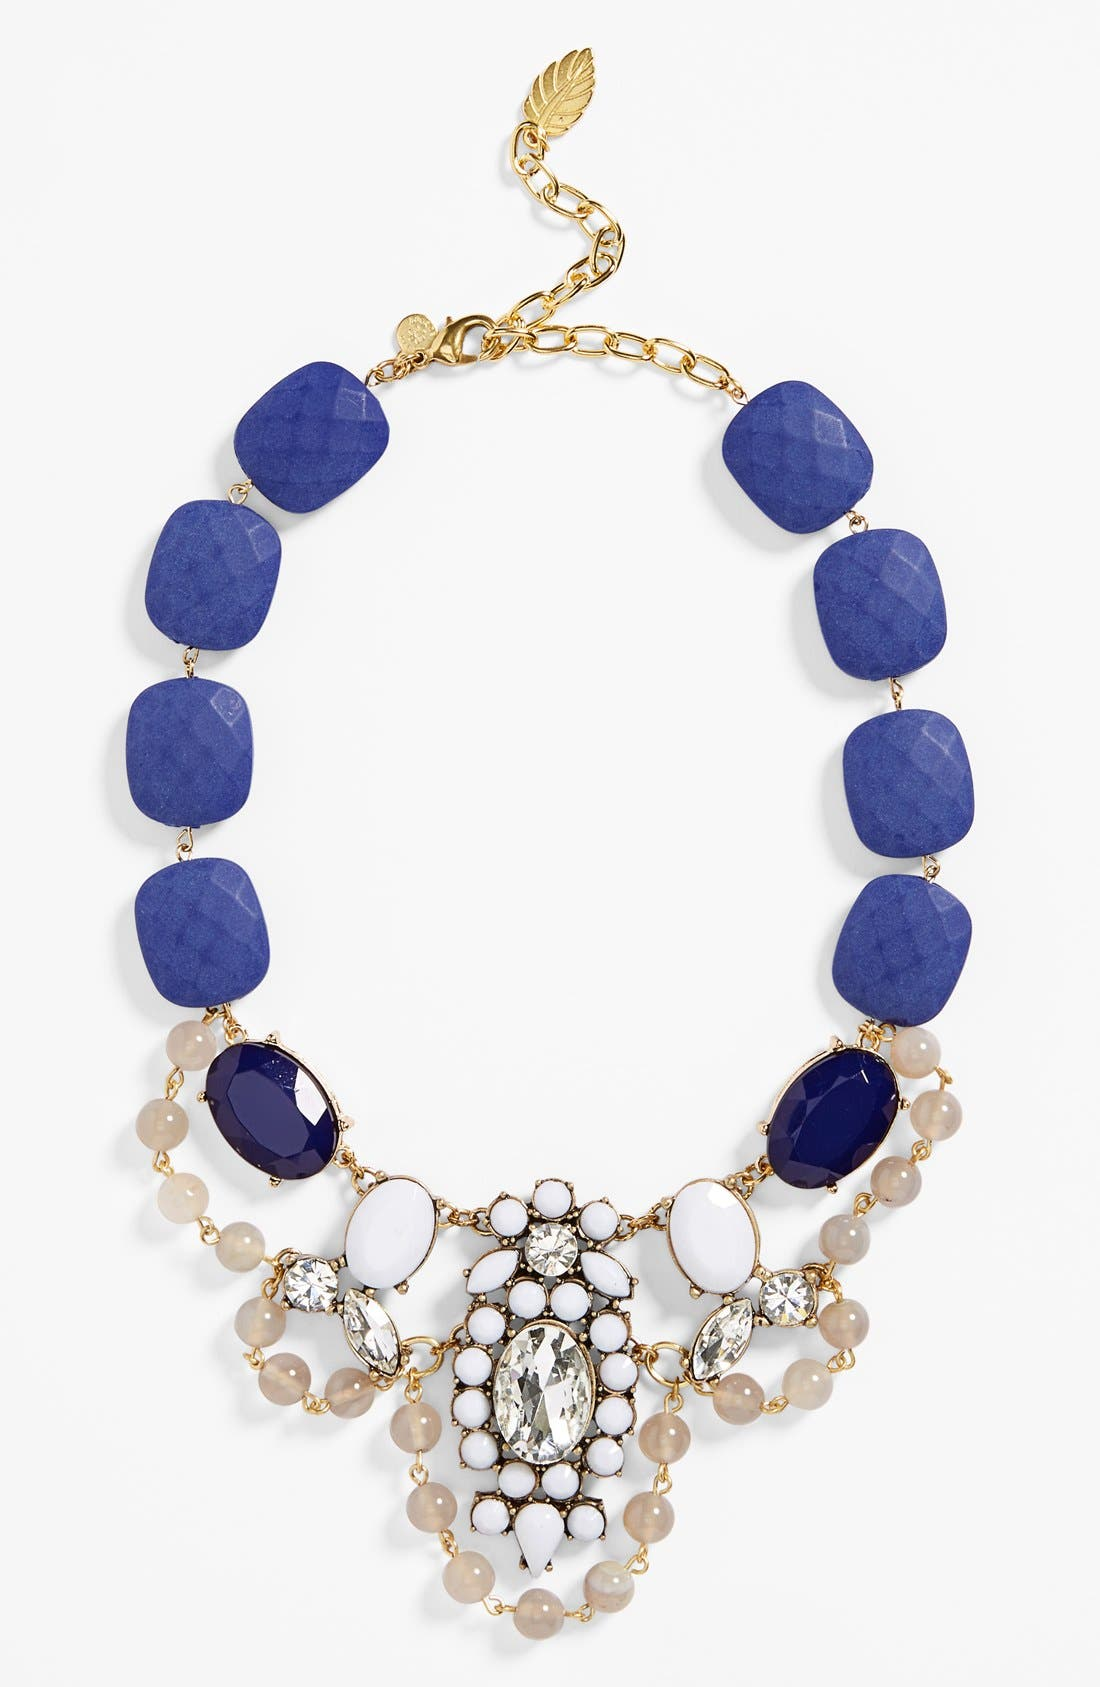 Main Image - David Aubrey 'Clara' Beaded Crystal Statement Necklace